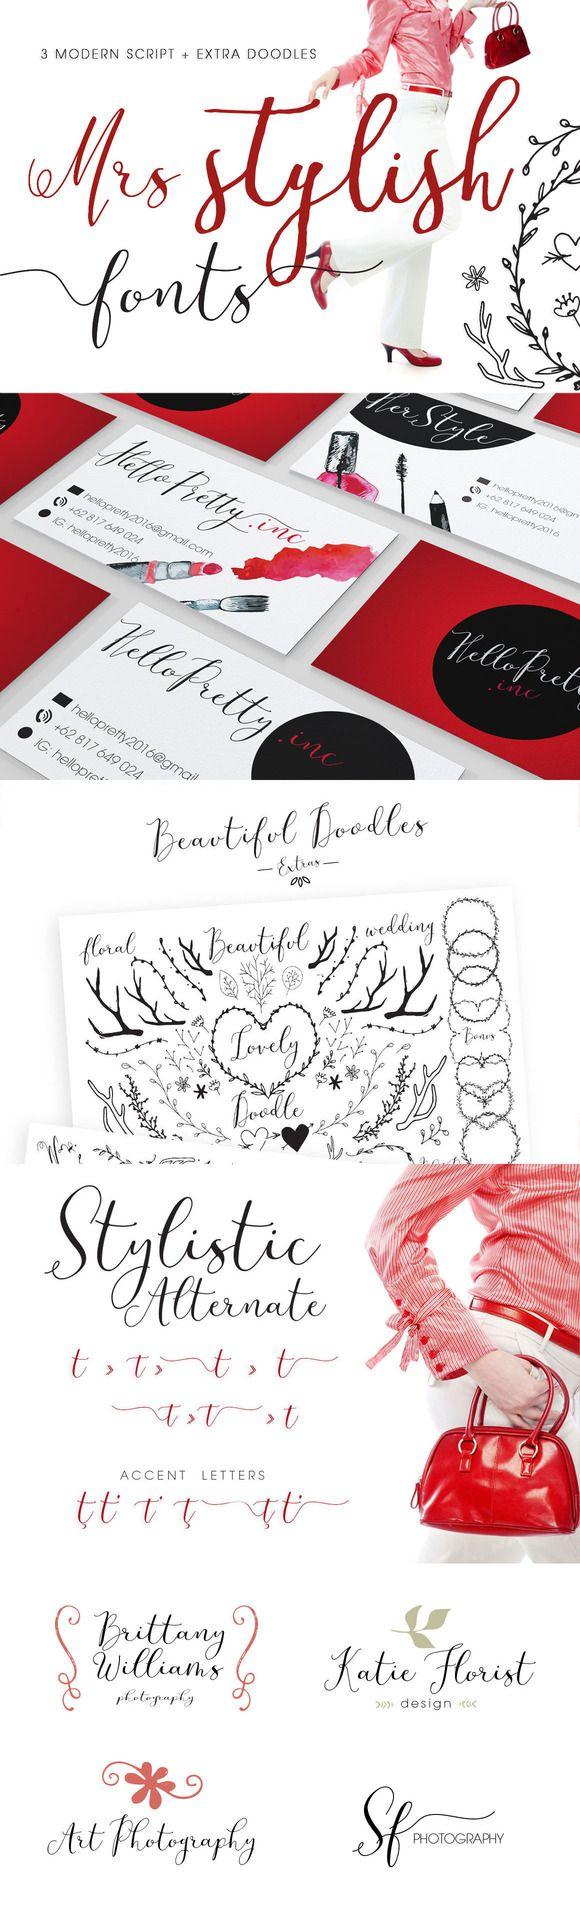 Mrs Stylish Fonts+Extras Update by mycandythemes on @creativemarket